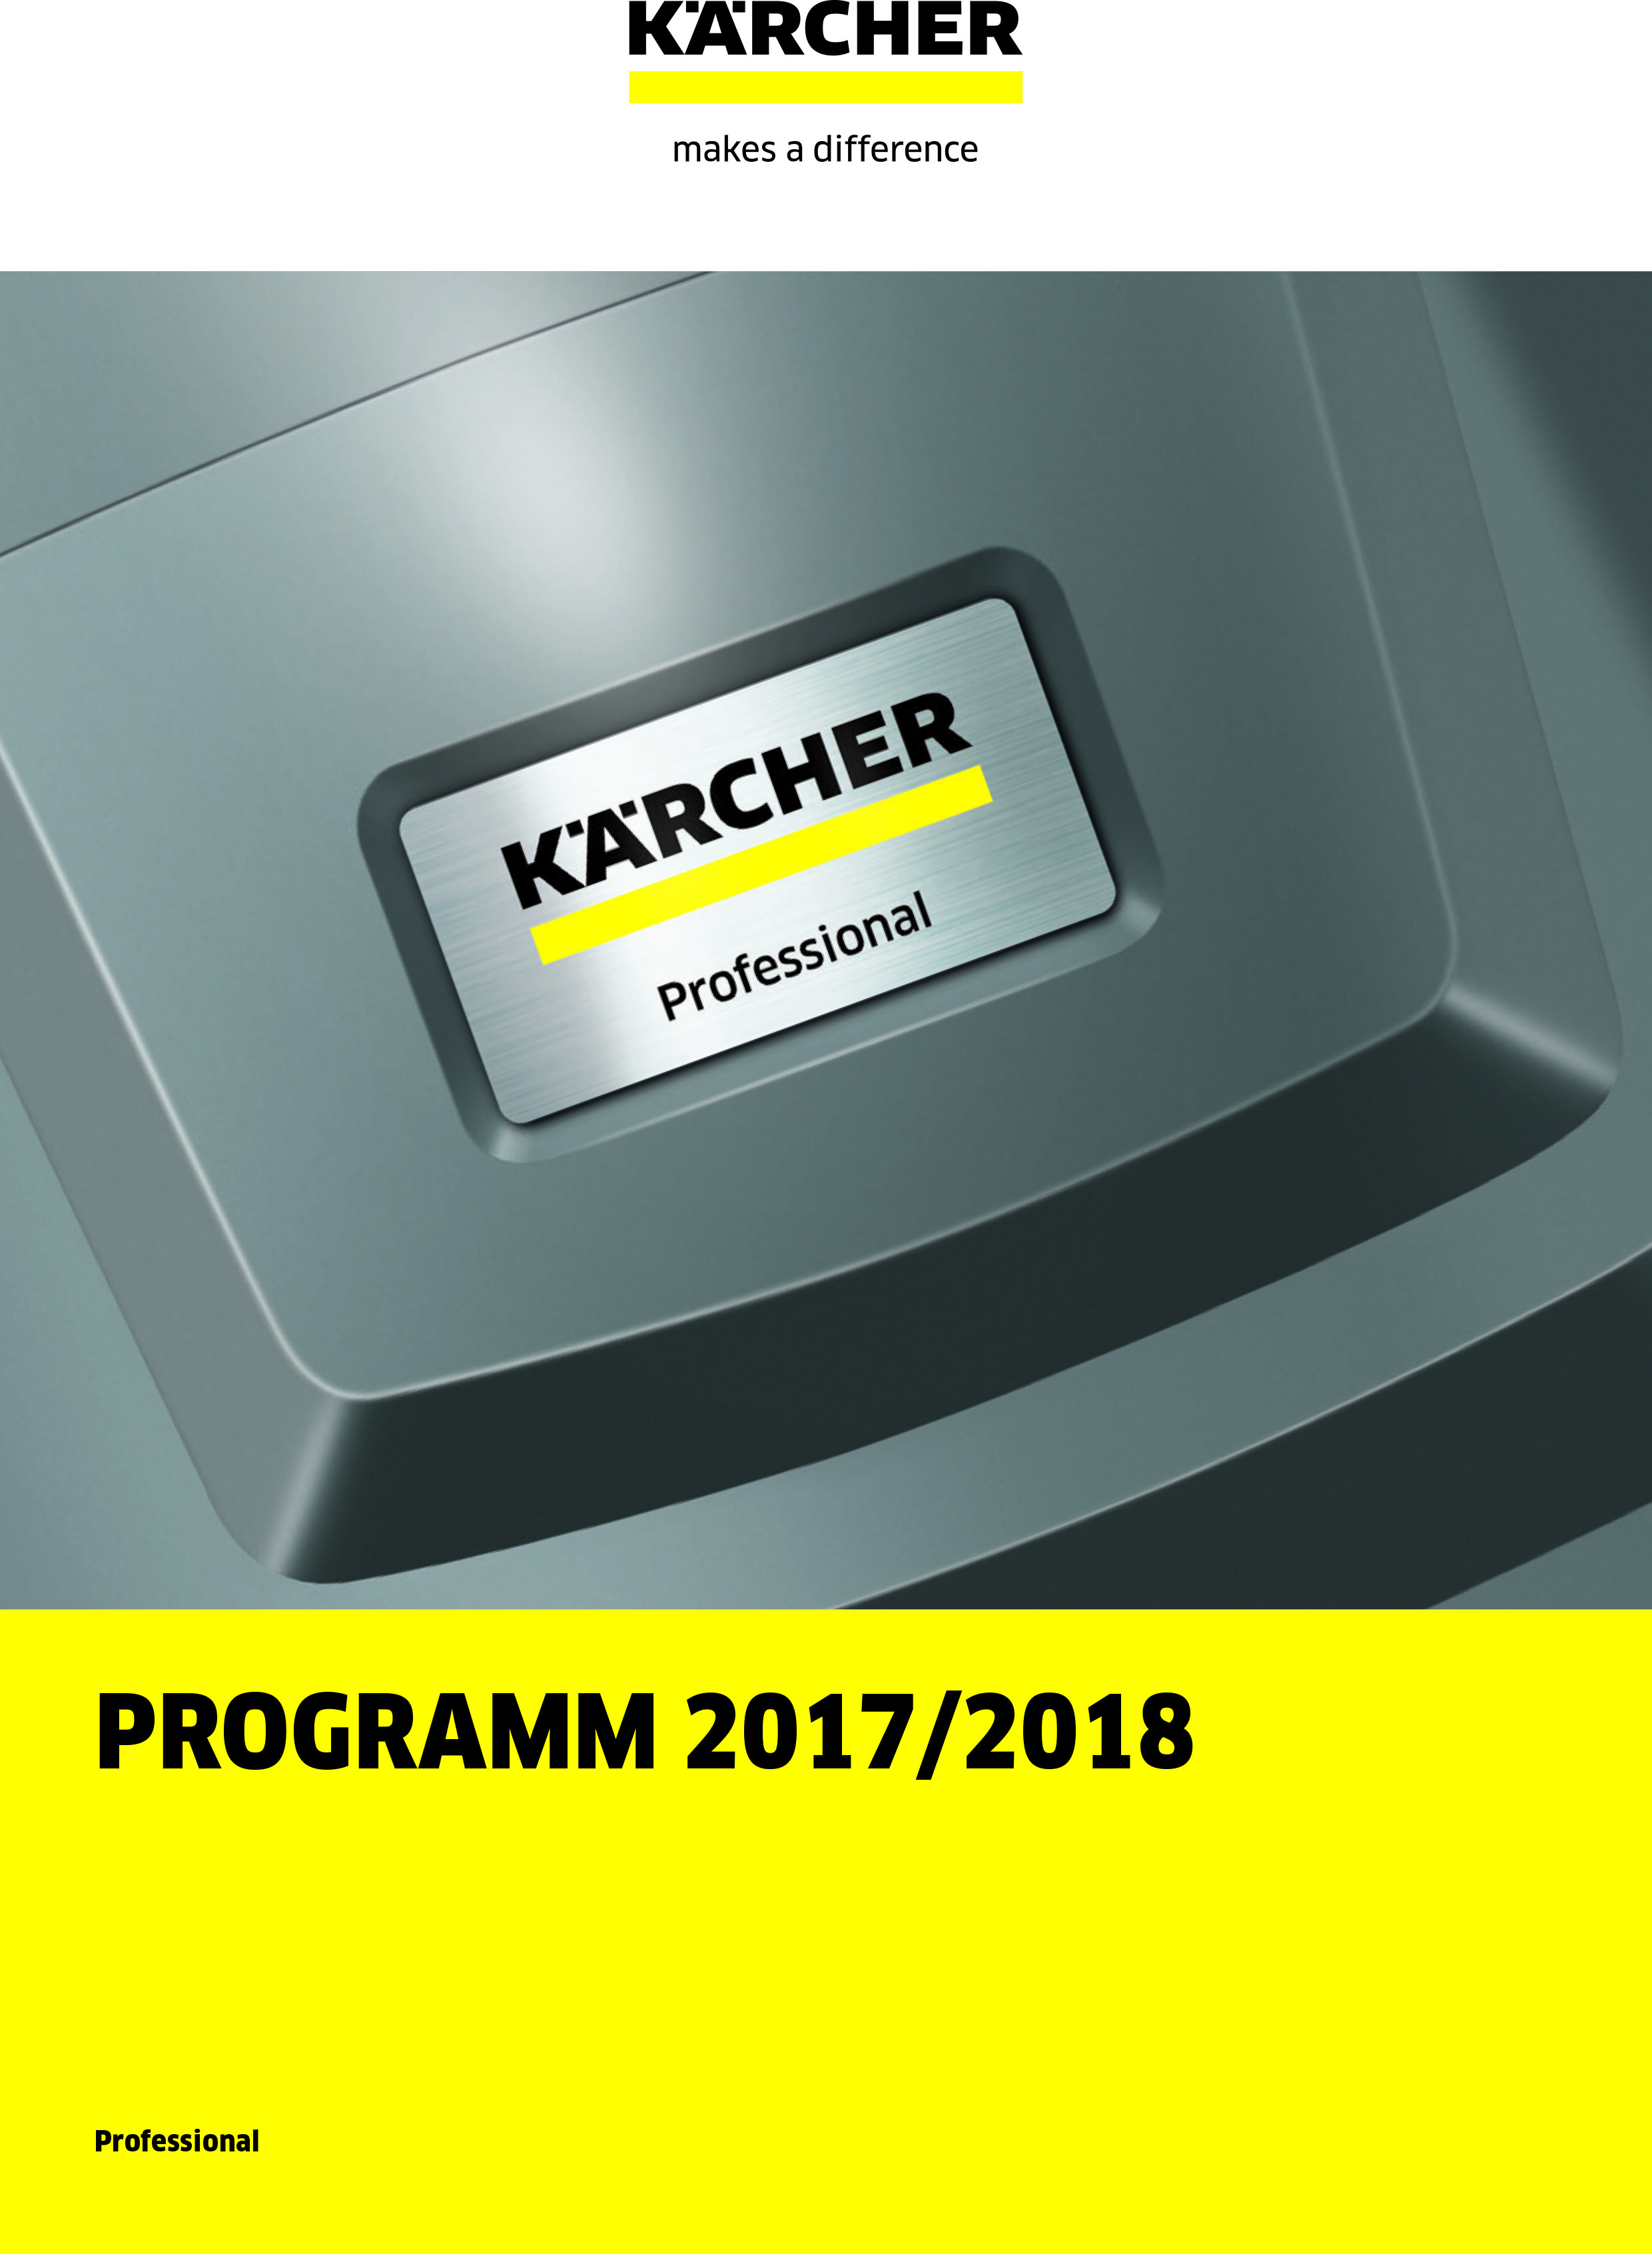 Kärcher Professional 2017/2018 1/3